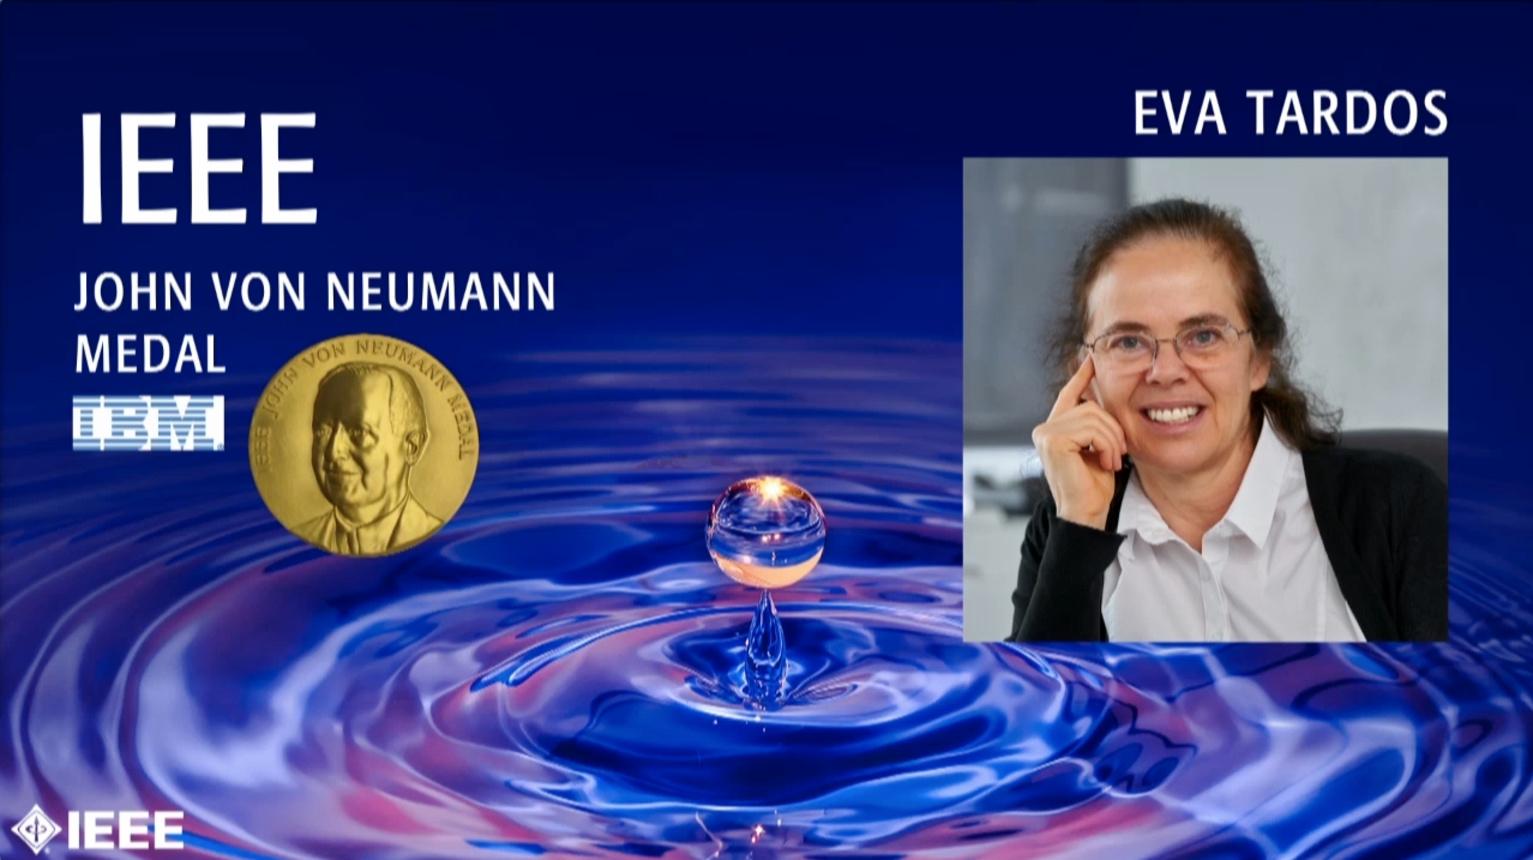 Eva Tardos - IEEE John von Neumann Medal, 2019 IEEE Honors Ceremony